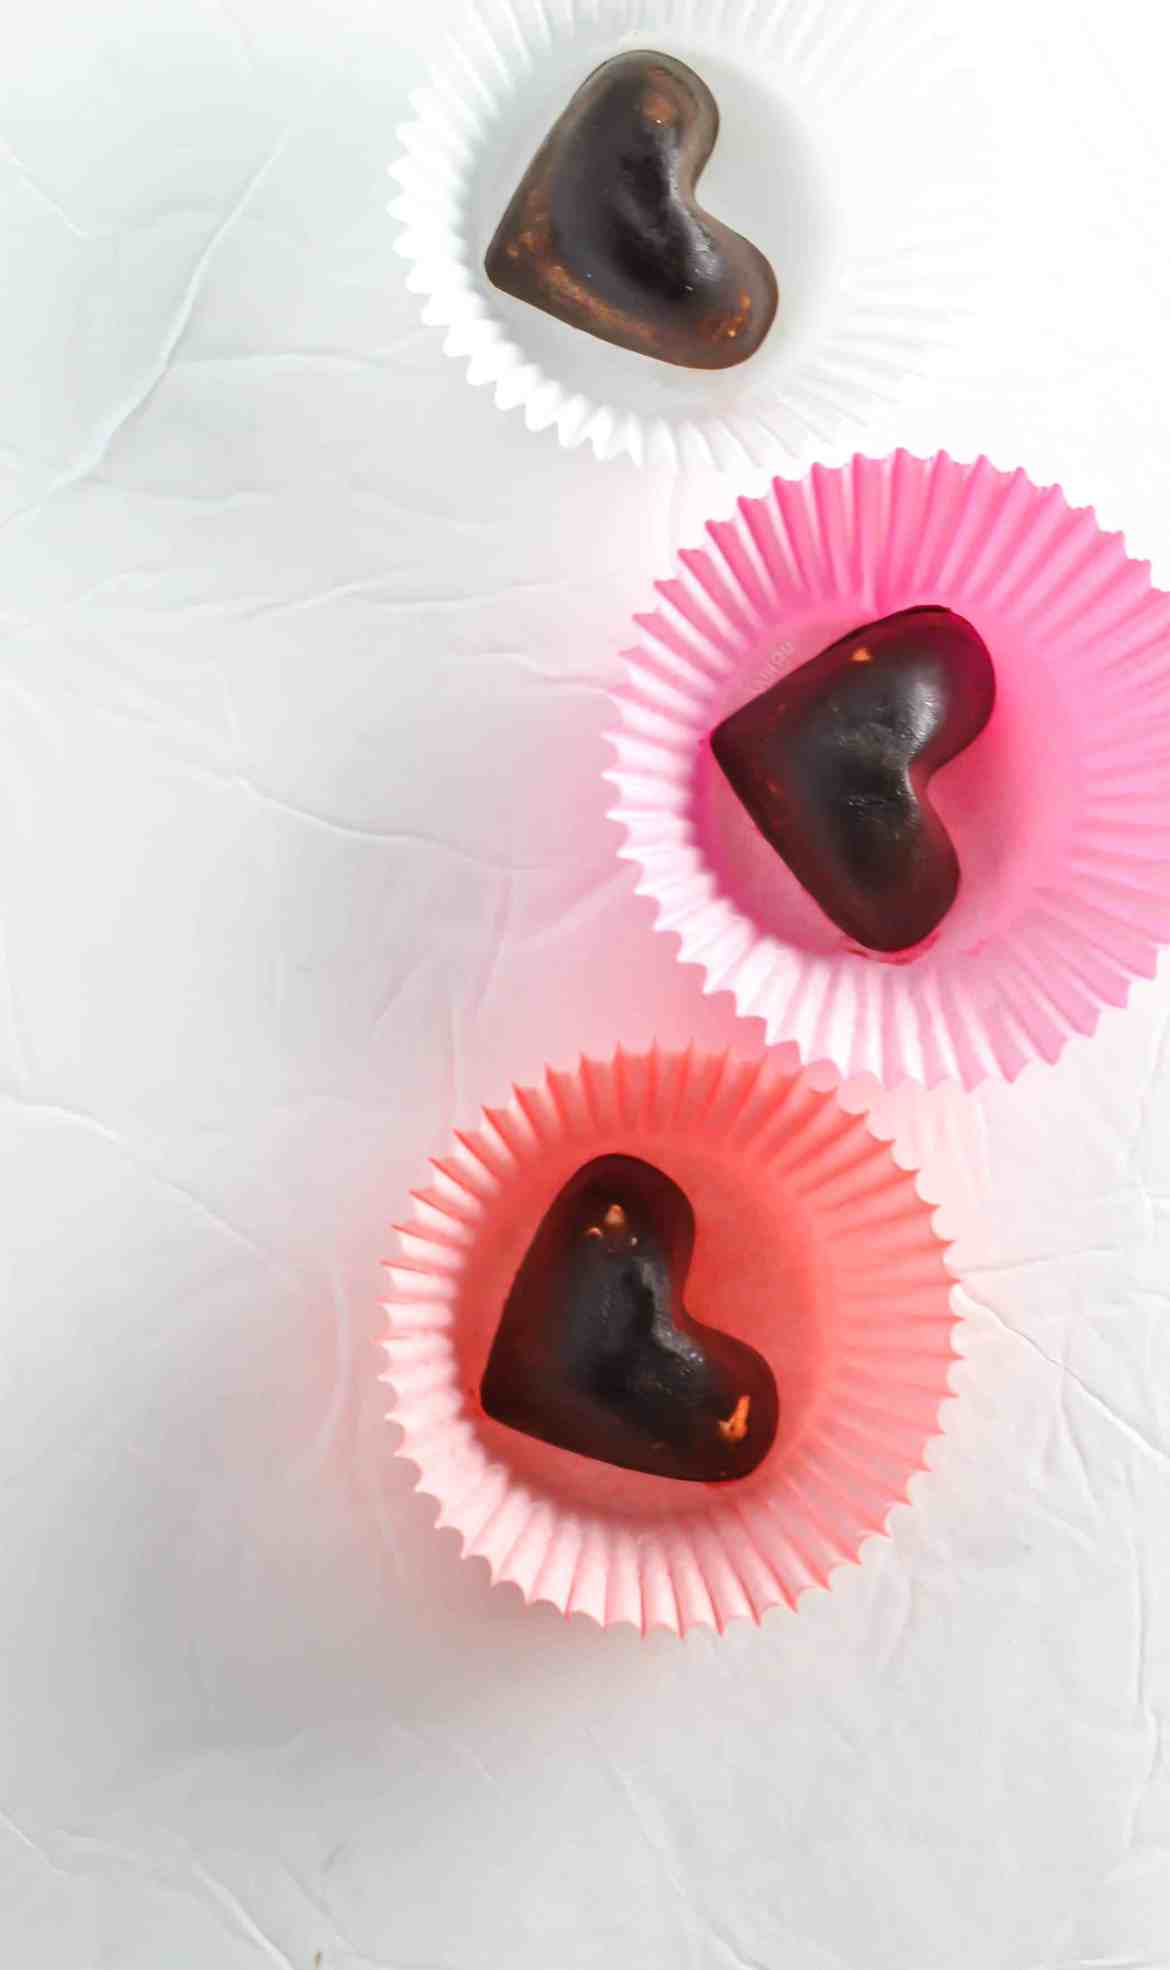 Chocolate Fat Bomb with Macadamia & Sea Salt [Recipe] | KETOGASM.com #keto #fatbomb #lchf #lowcarb #ketogenic #ketosis #recipe #chocolate #macademia #seasalt #paleo